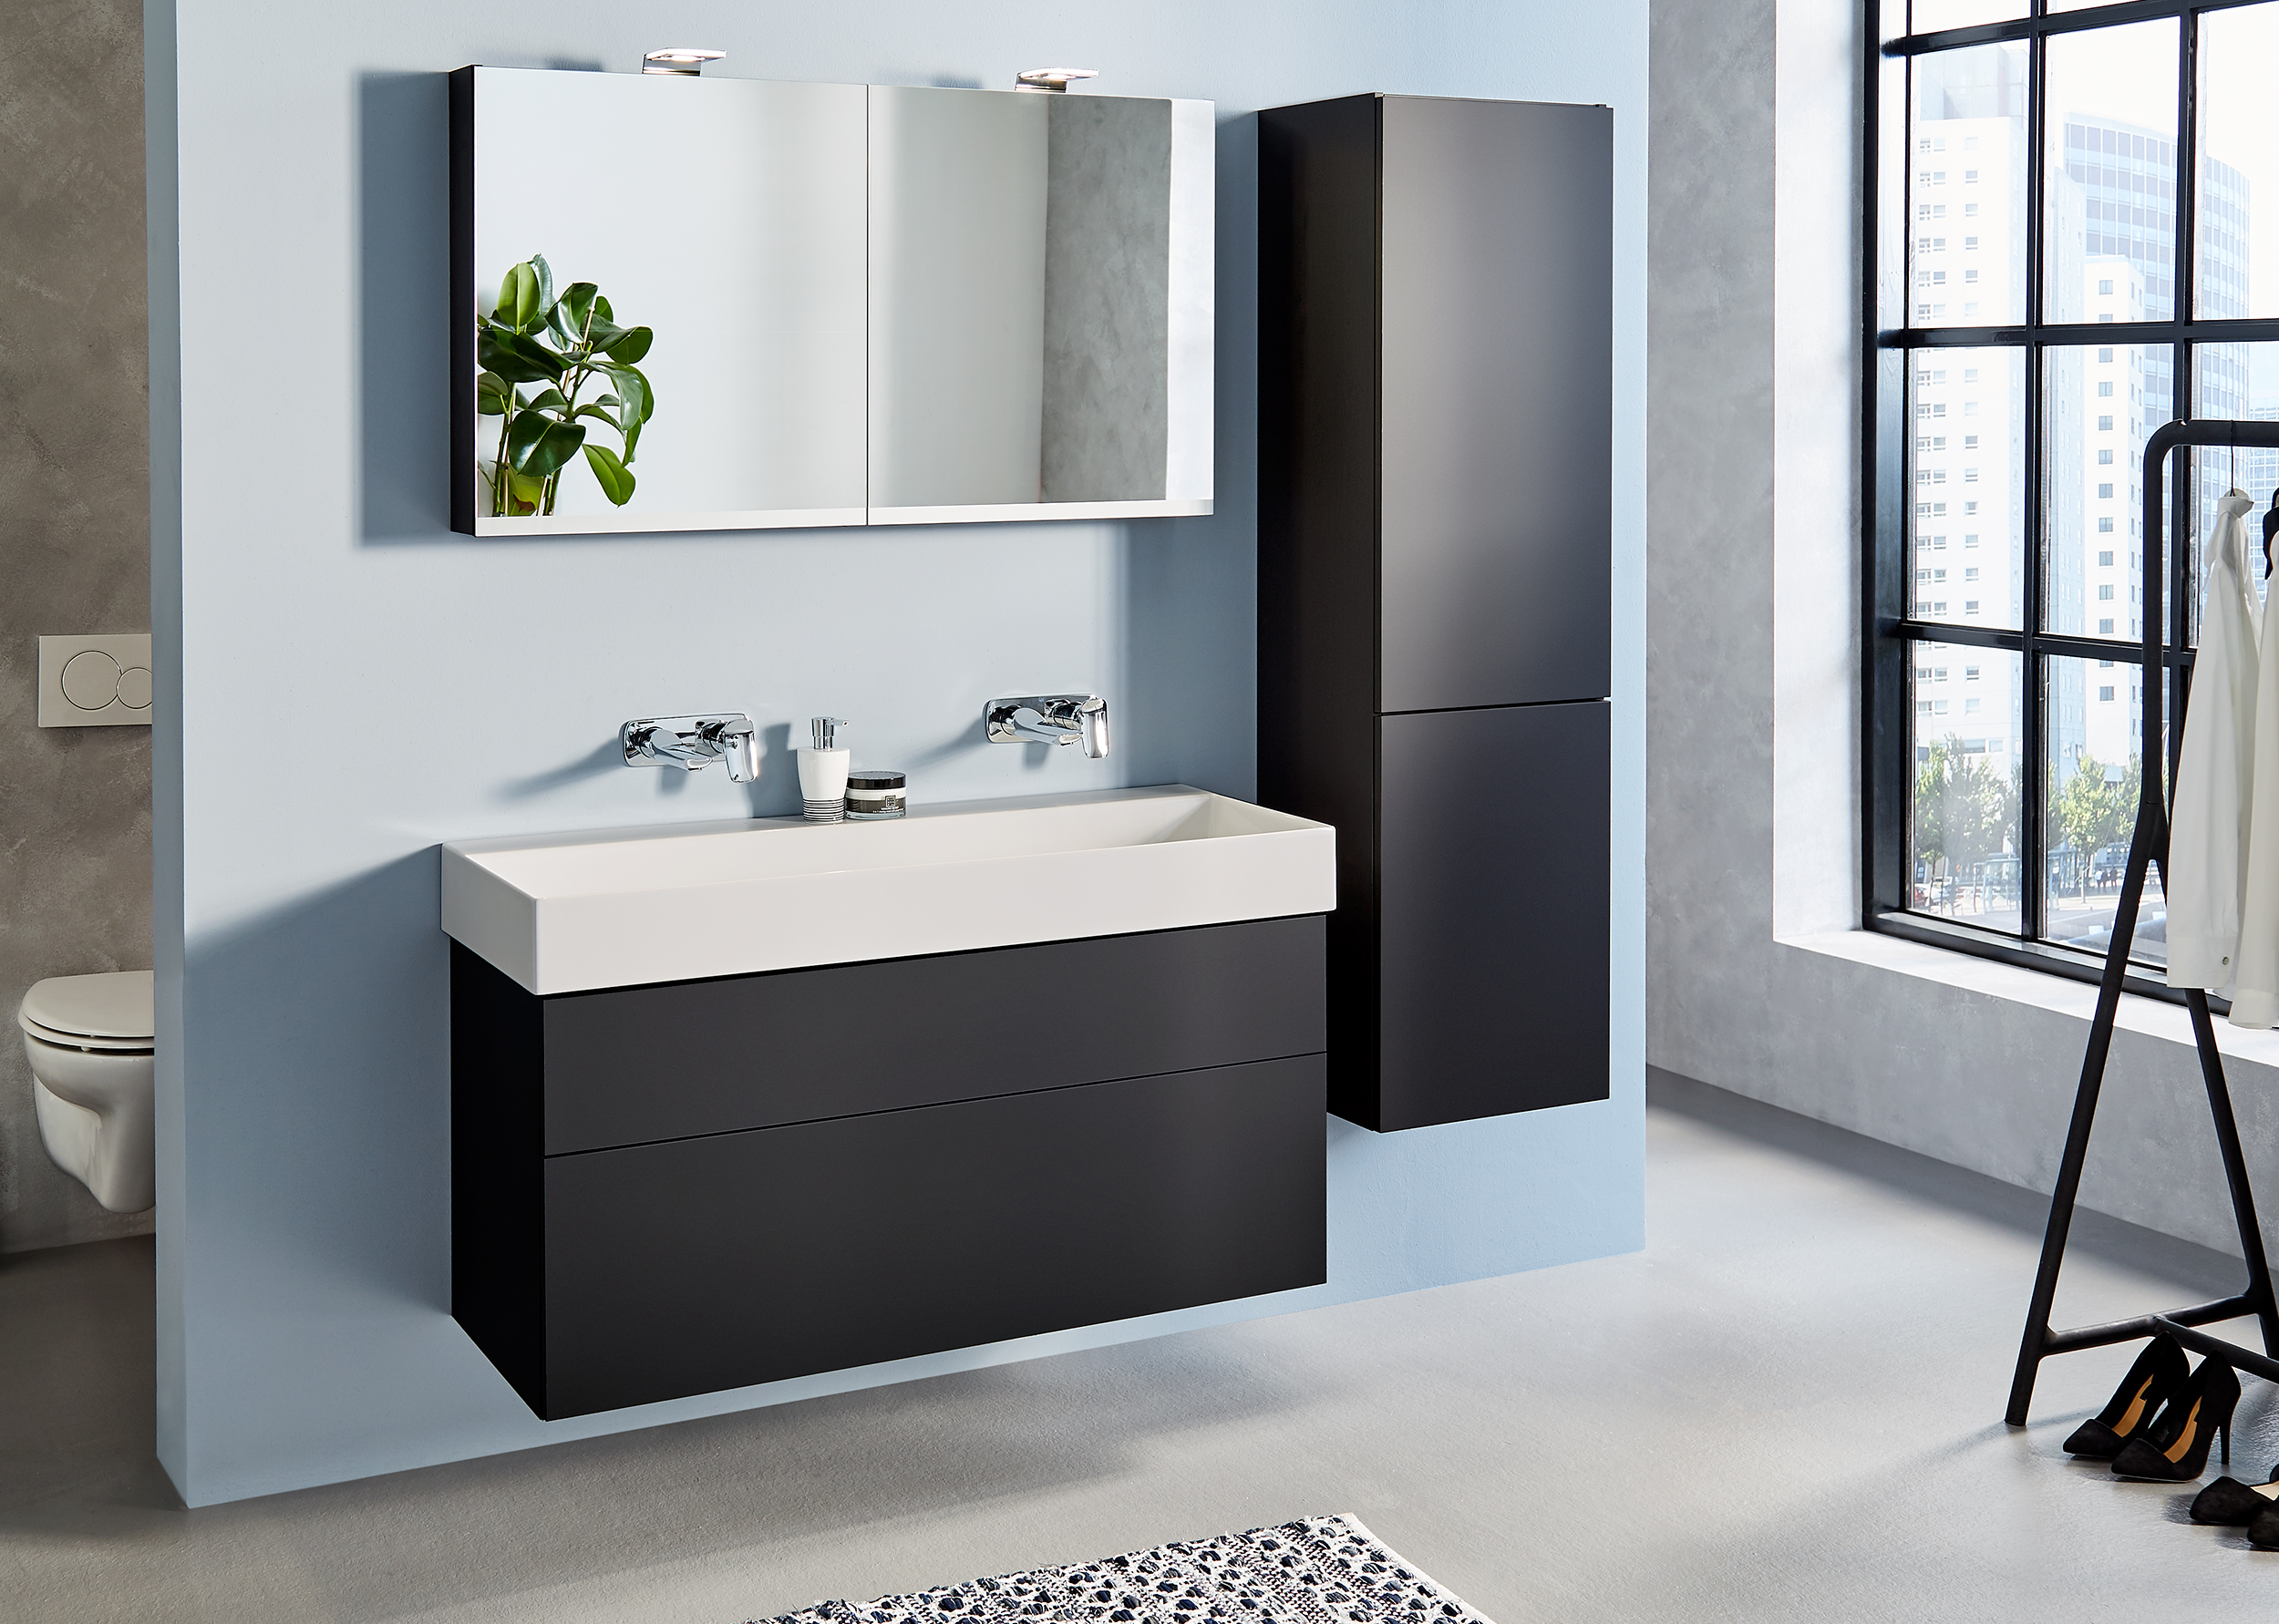 Mijn-bad-in-stijl-cool-blue-badkamer